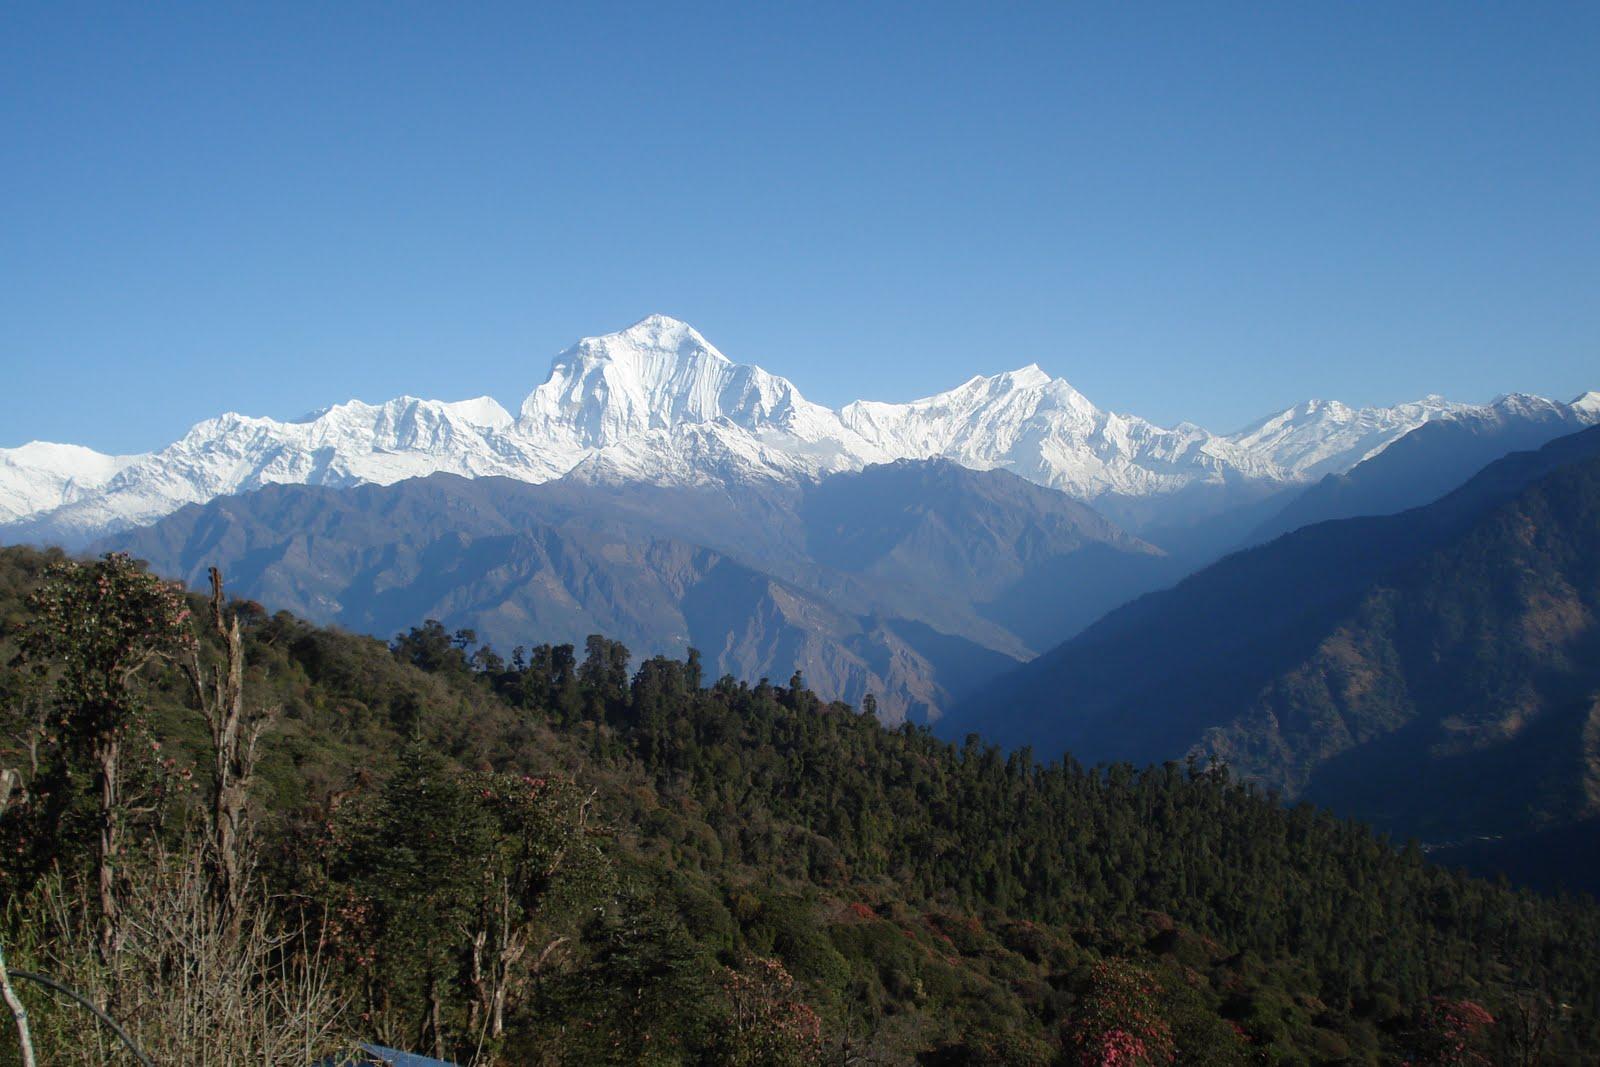 trekking nepal a travelers guide 8th ed